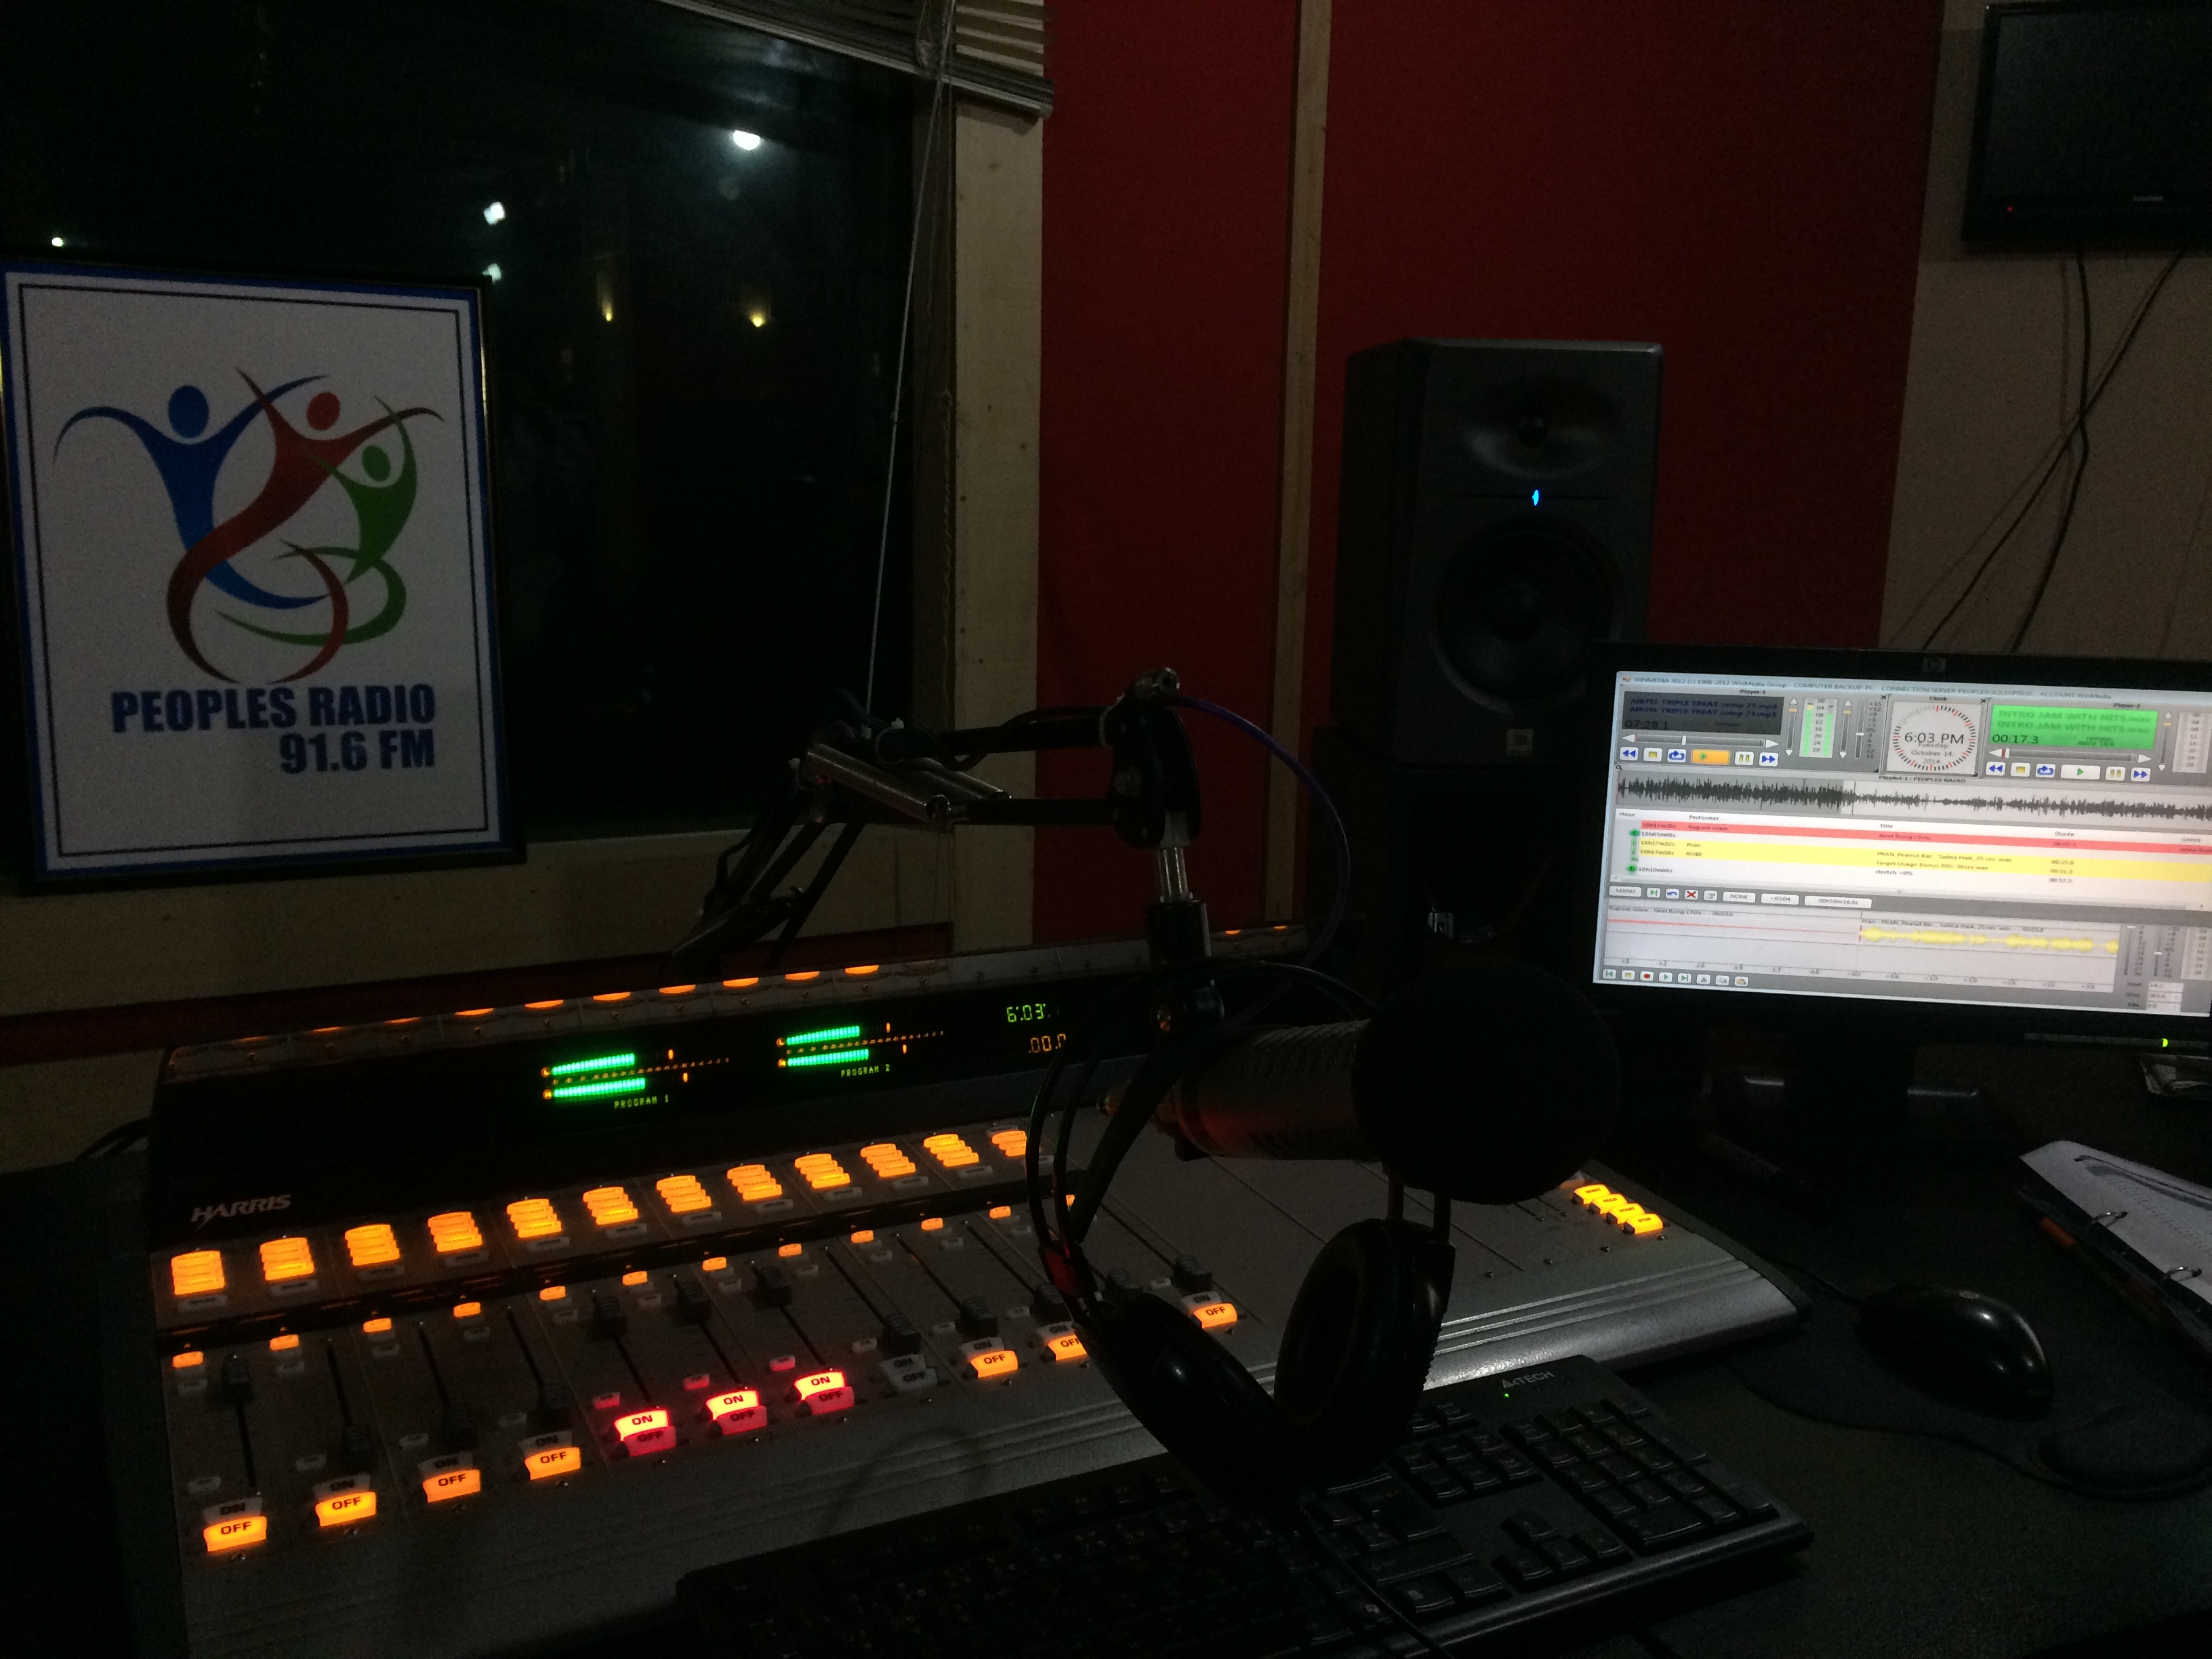 Peoples Radio désormais motorisée par WinMedia